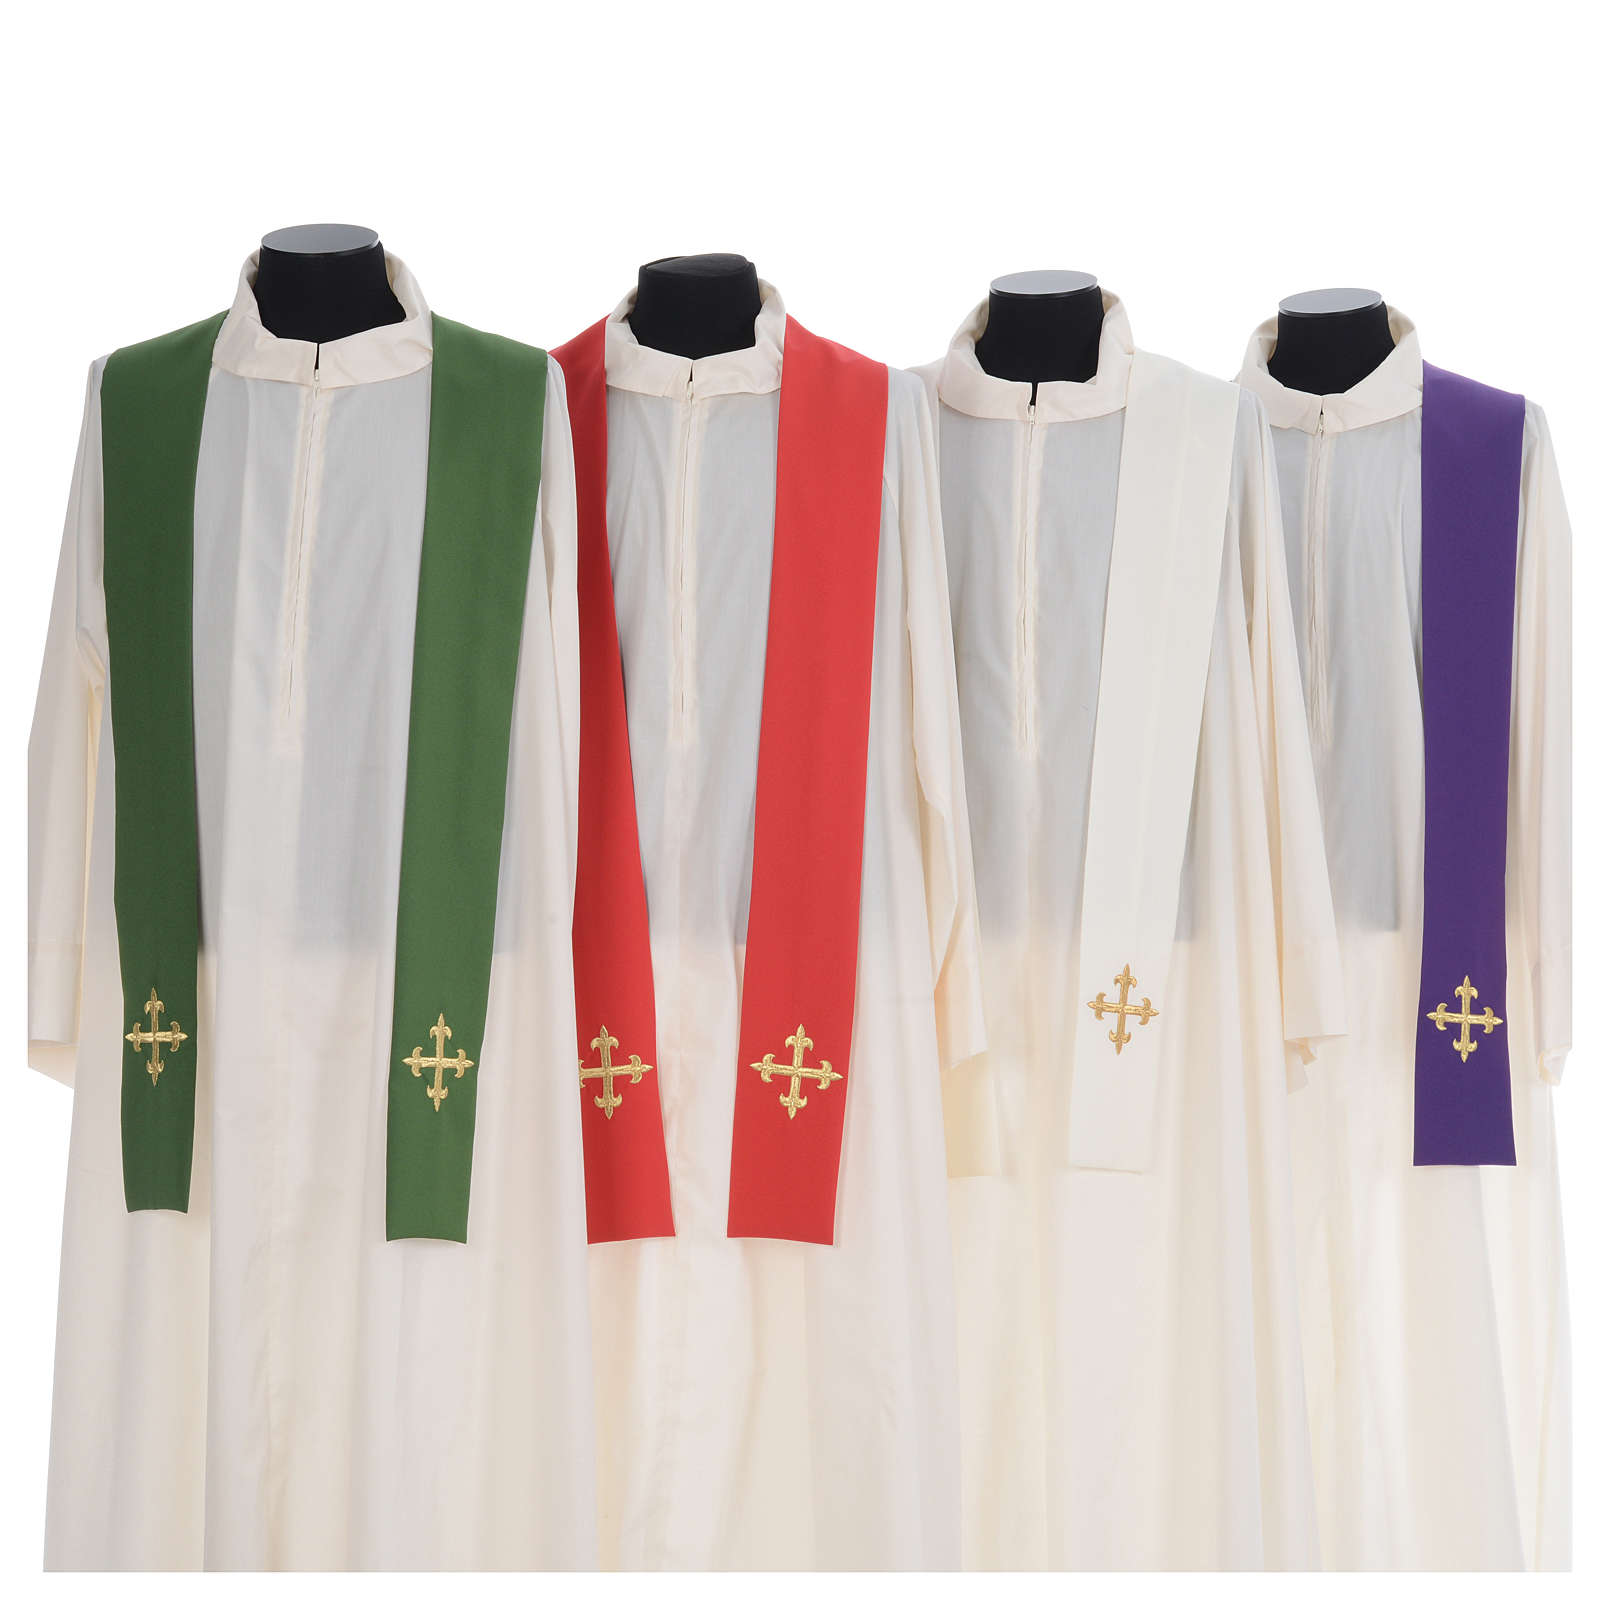 Chasuble croix dorée 100% polyester 4